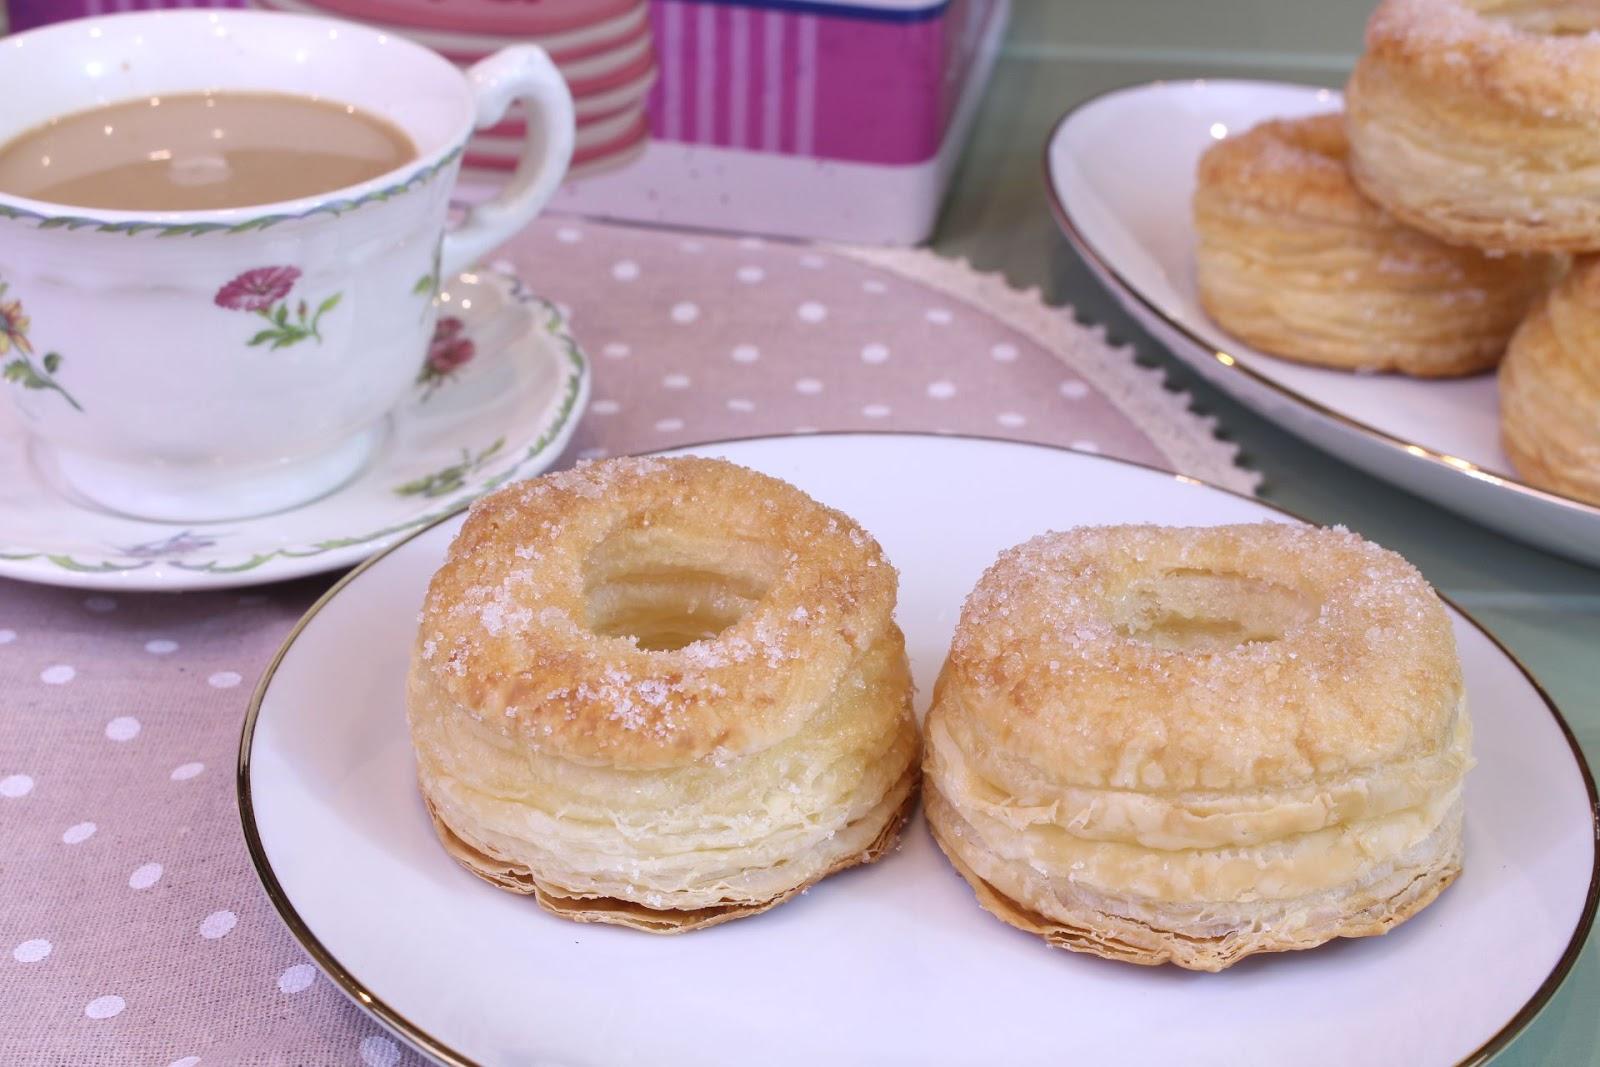 Receta de donuts de hojaldre